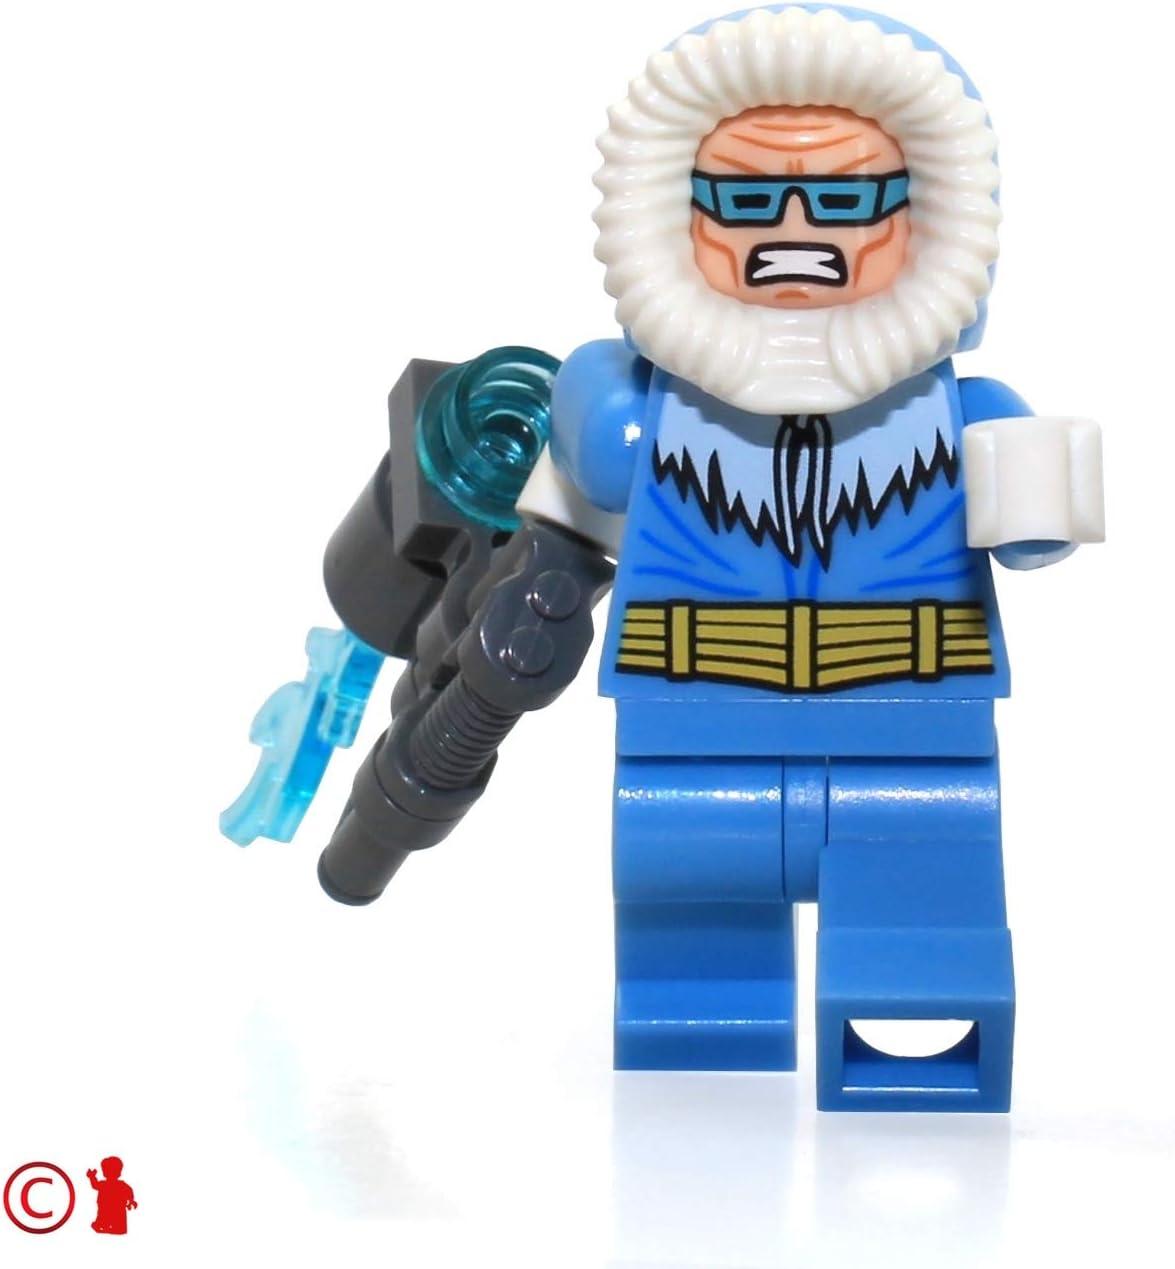 Amazon Com Lego Dc Super Heroes Justice League Minifigure Captain Cold With Freeze Gun 76026 Toys Games